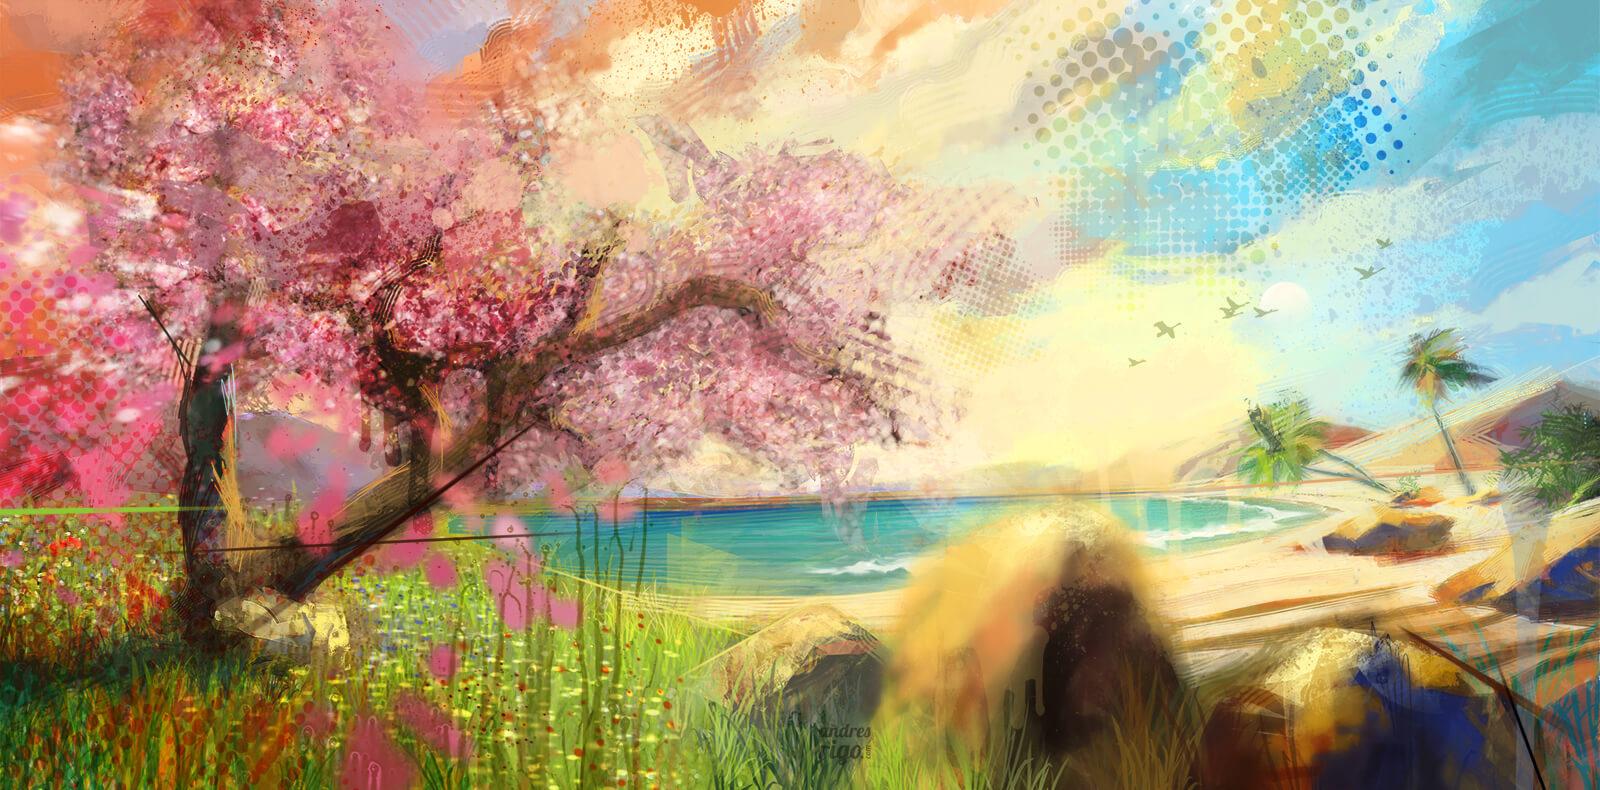 Zpu álbum Primavera